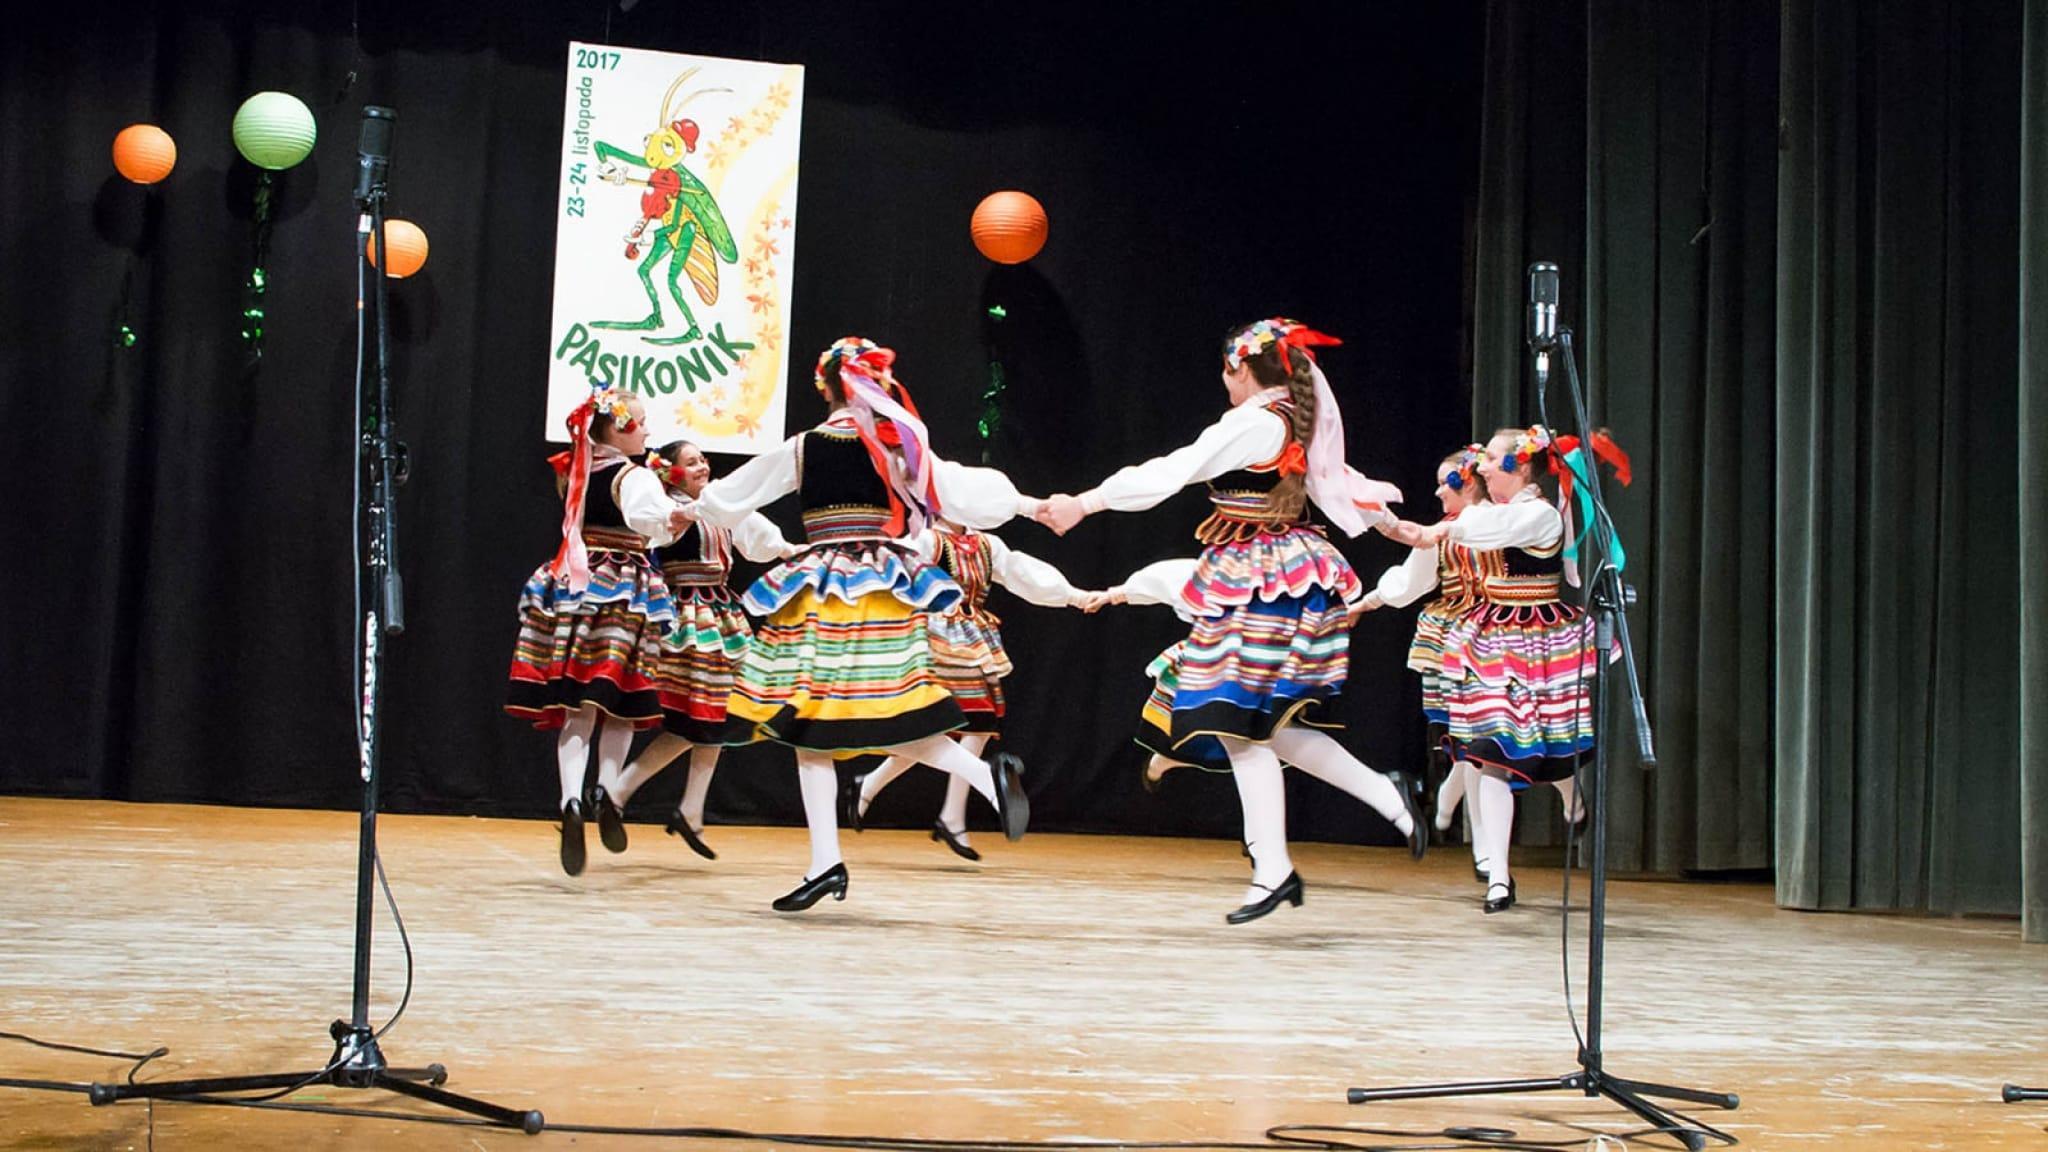 Pasikonik 2017 - część konkursowa